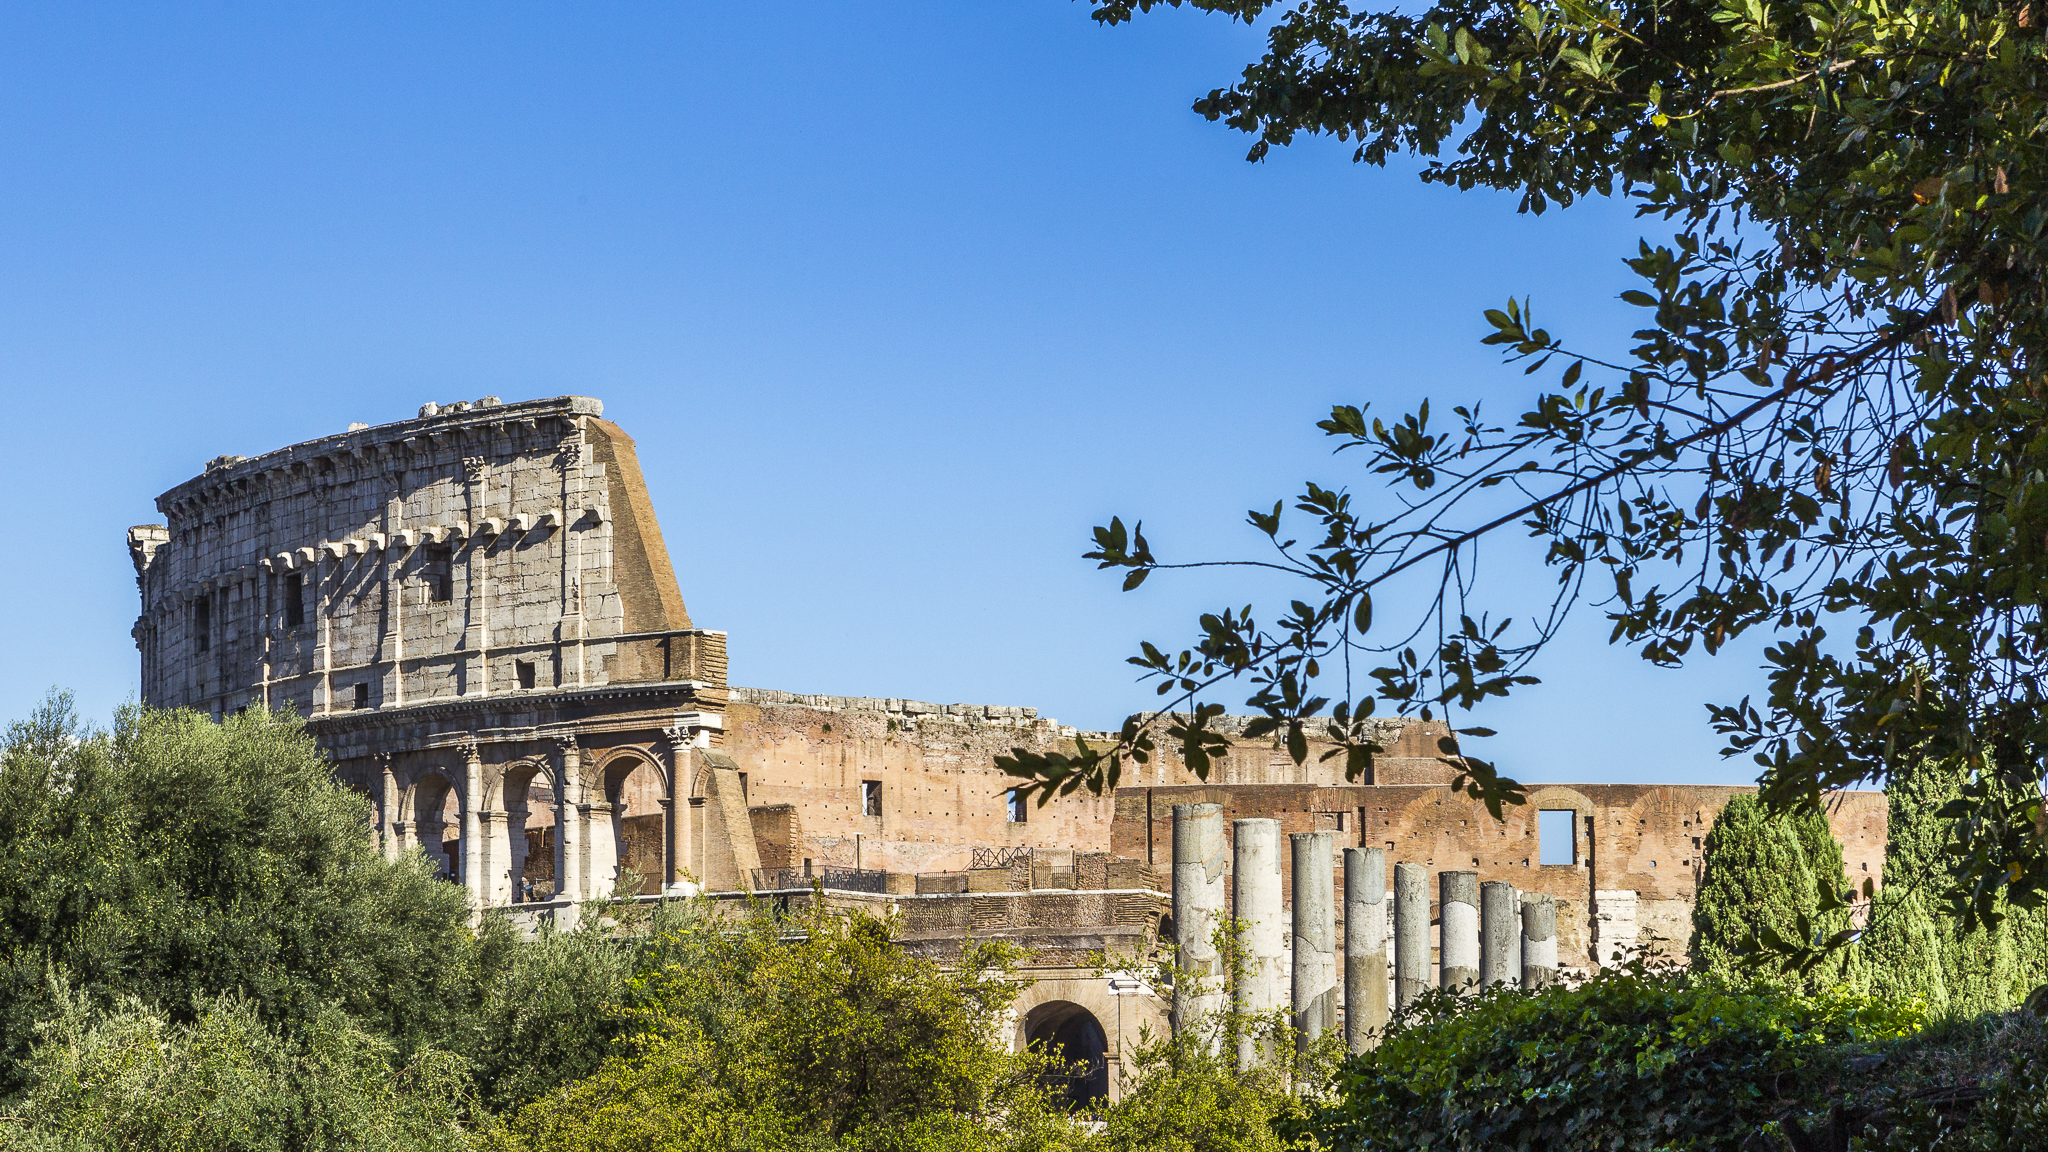 Colosseum, Flavian Amphitheatre, Italy